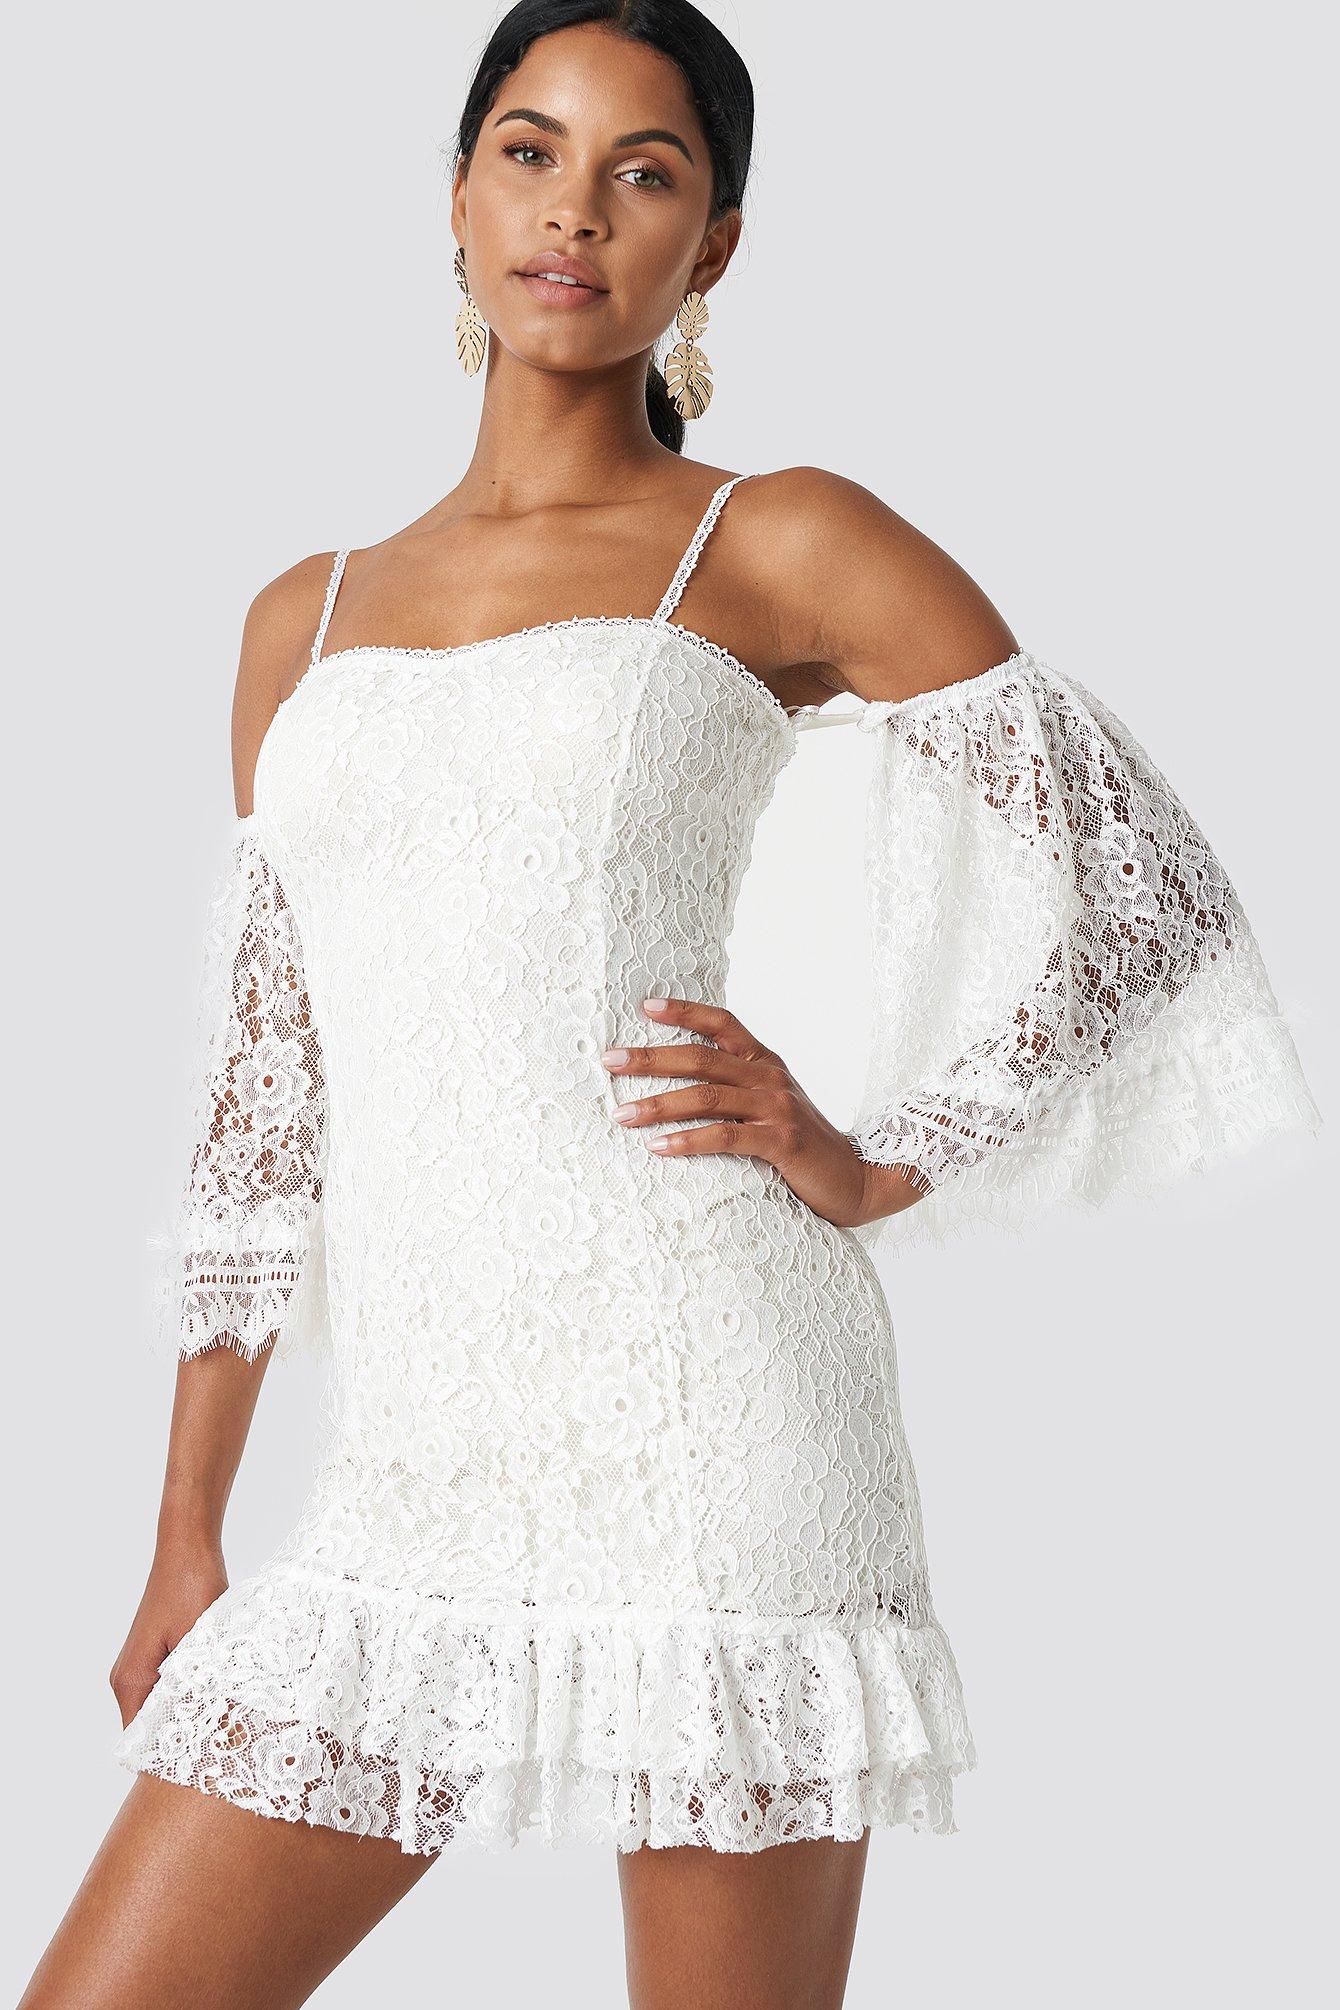 TRENDYOL RUFFLE BOTTOM LACE DRESS - WHITE, OFFWHITE